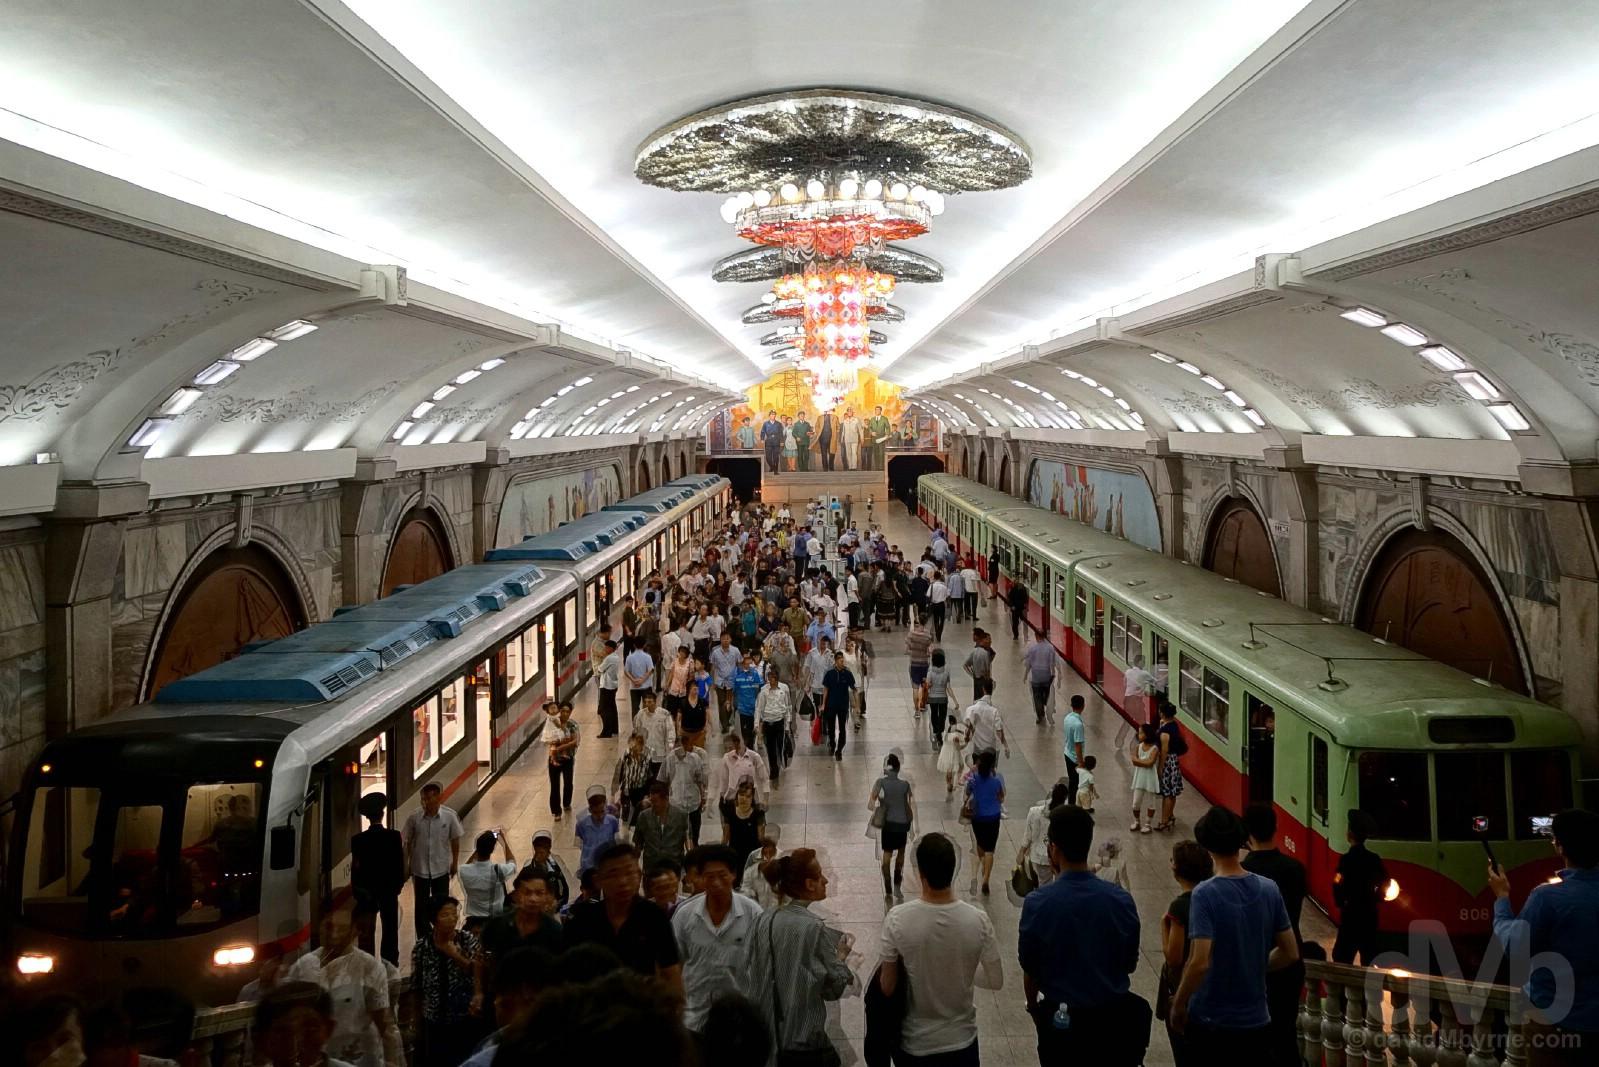 A platform of the Pyongyang Metro, the world's deepest. Pyongyang, North Korea. August 15, 2017.